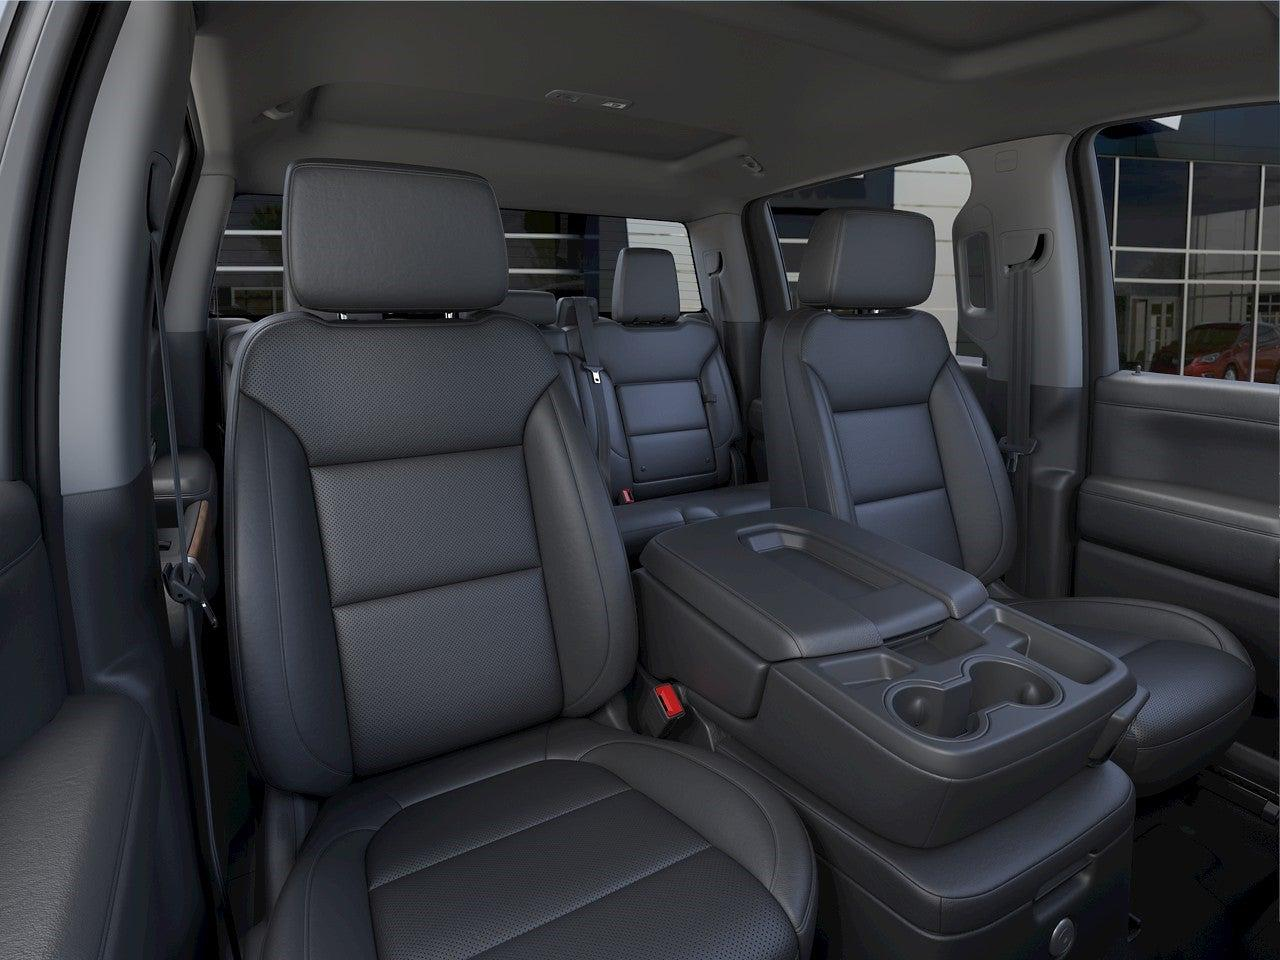 2021 GMC Sierra 1500 Crew Cab 4x4, Pickup #V21138 - photo 33